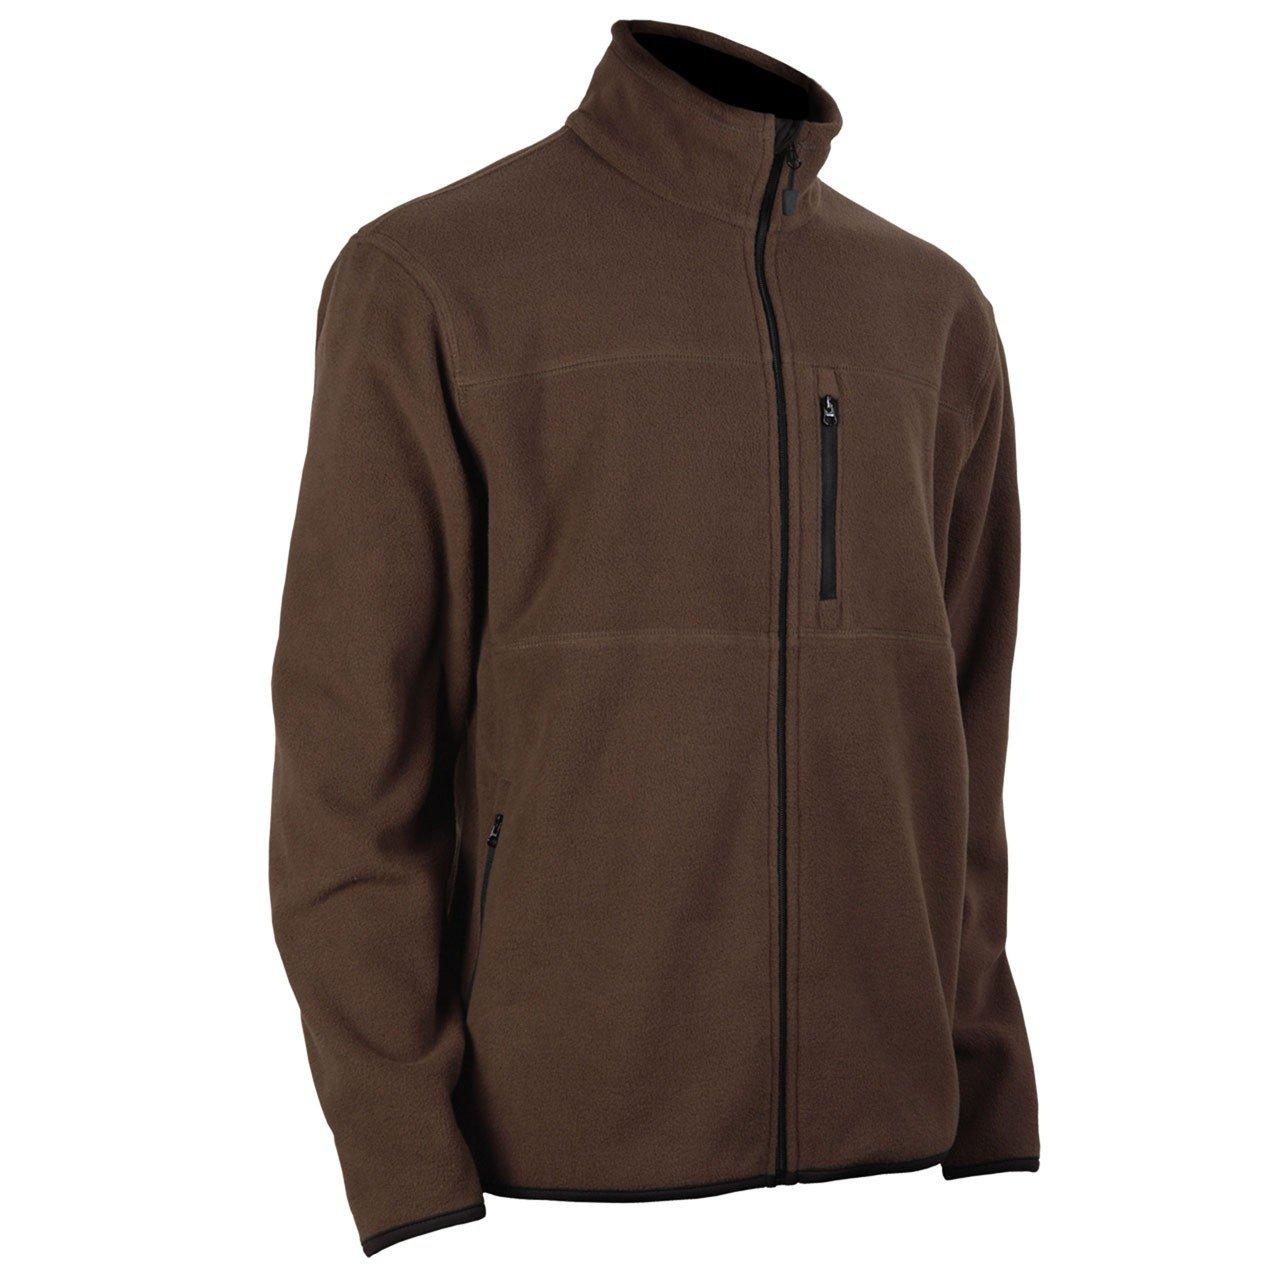 Tres Bien Golf Mens Fleece Jacket-Brown-Medium by Tres Bien Golf